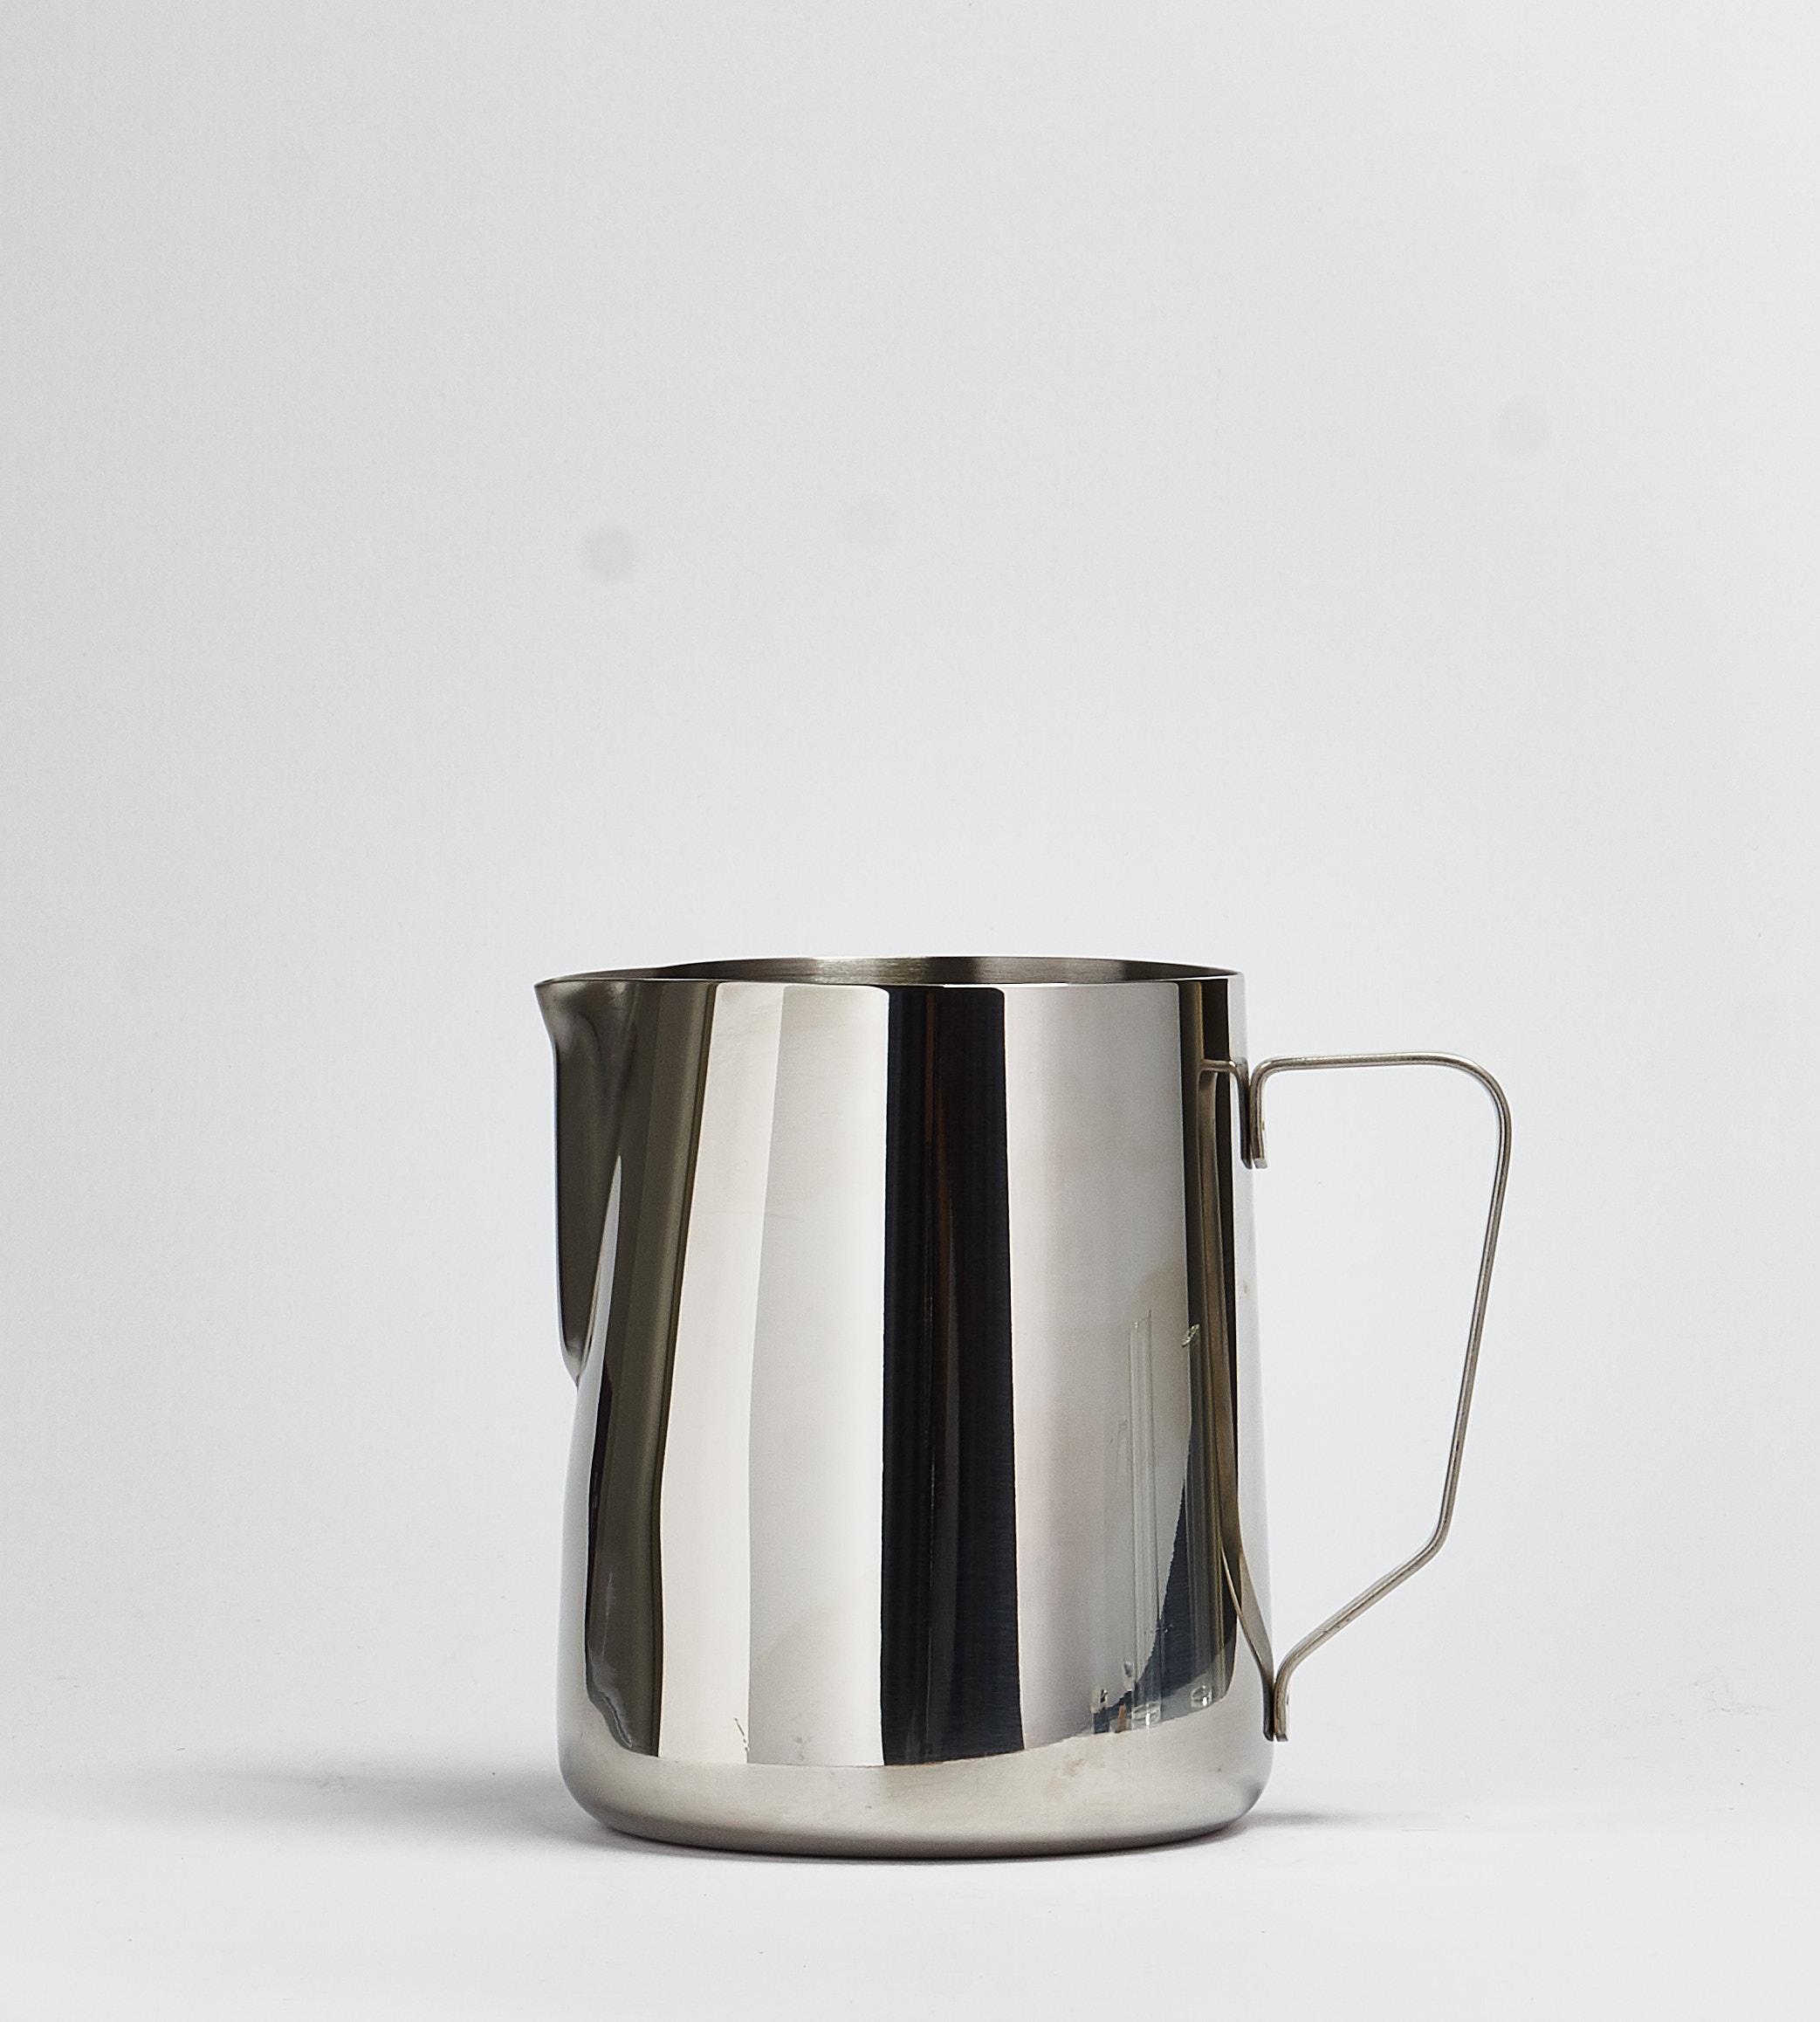 Milchkännchen Pro, Edelstahl-prev-2